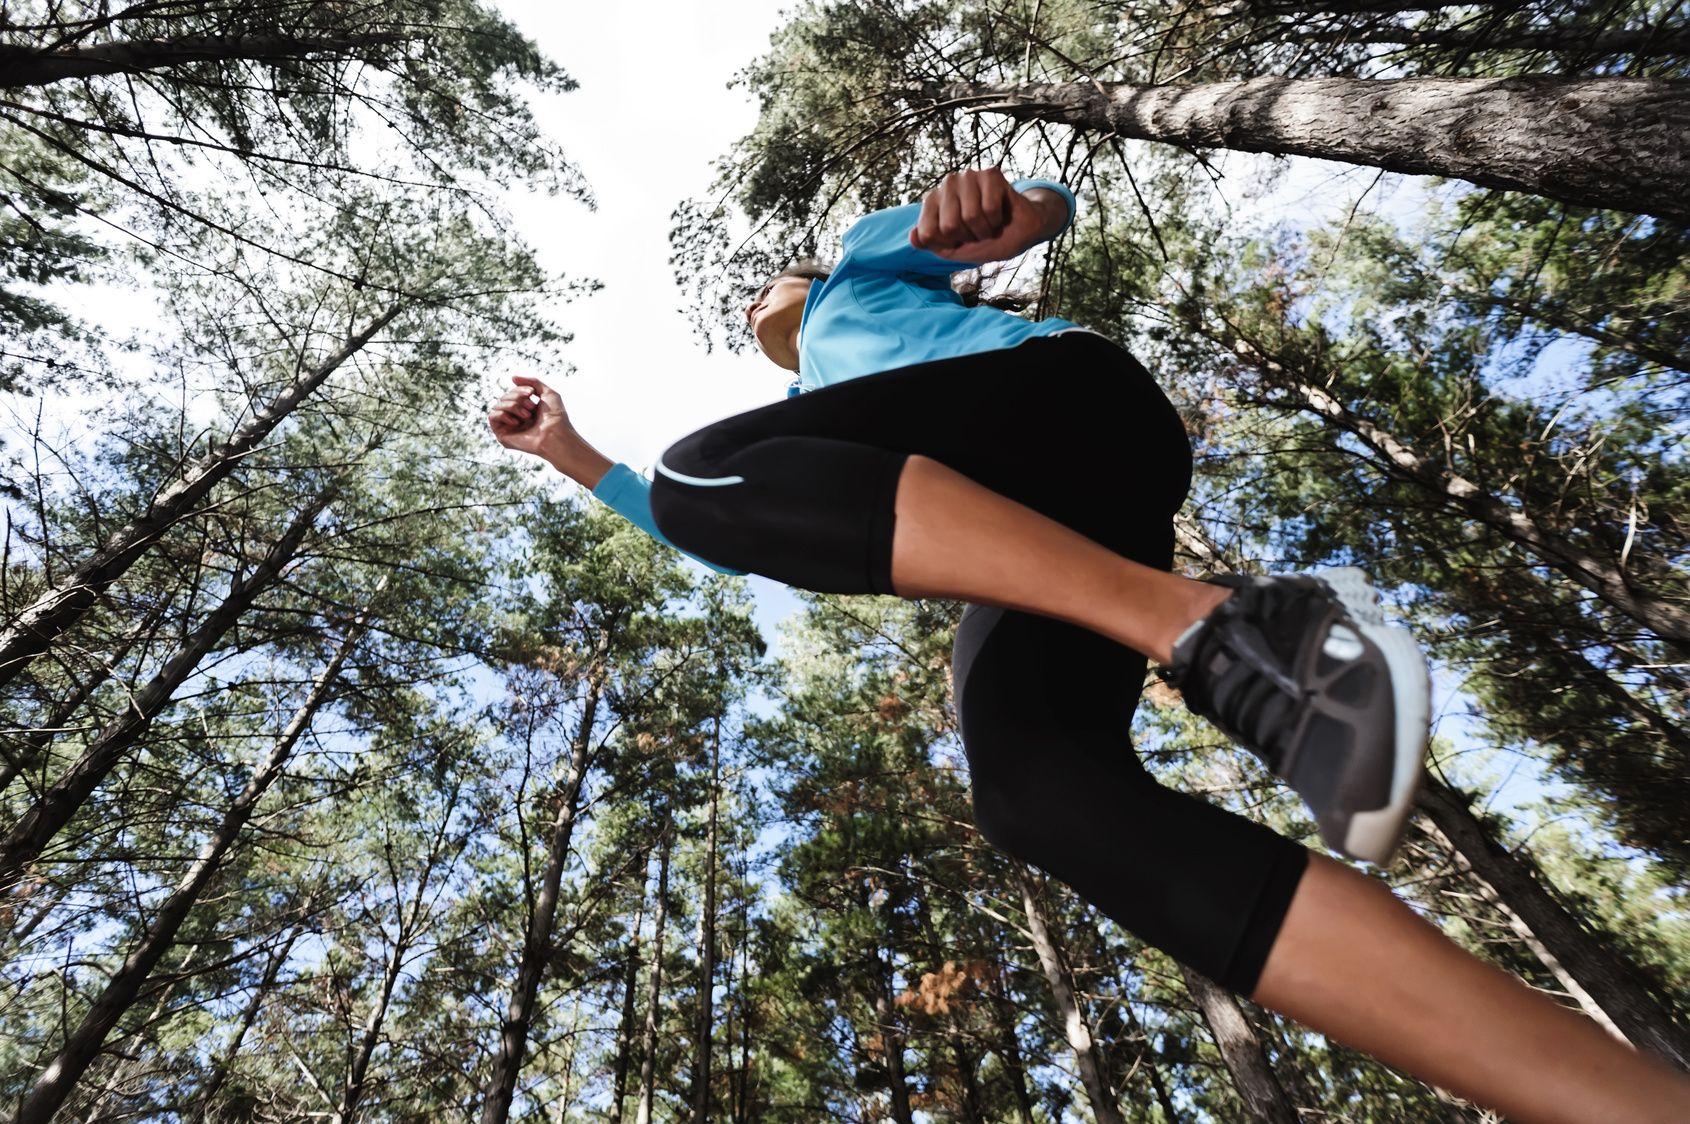 Тропа здоровья для занятий спортом в лесу фото 7